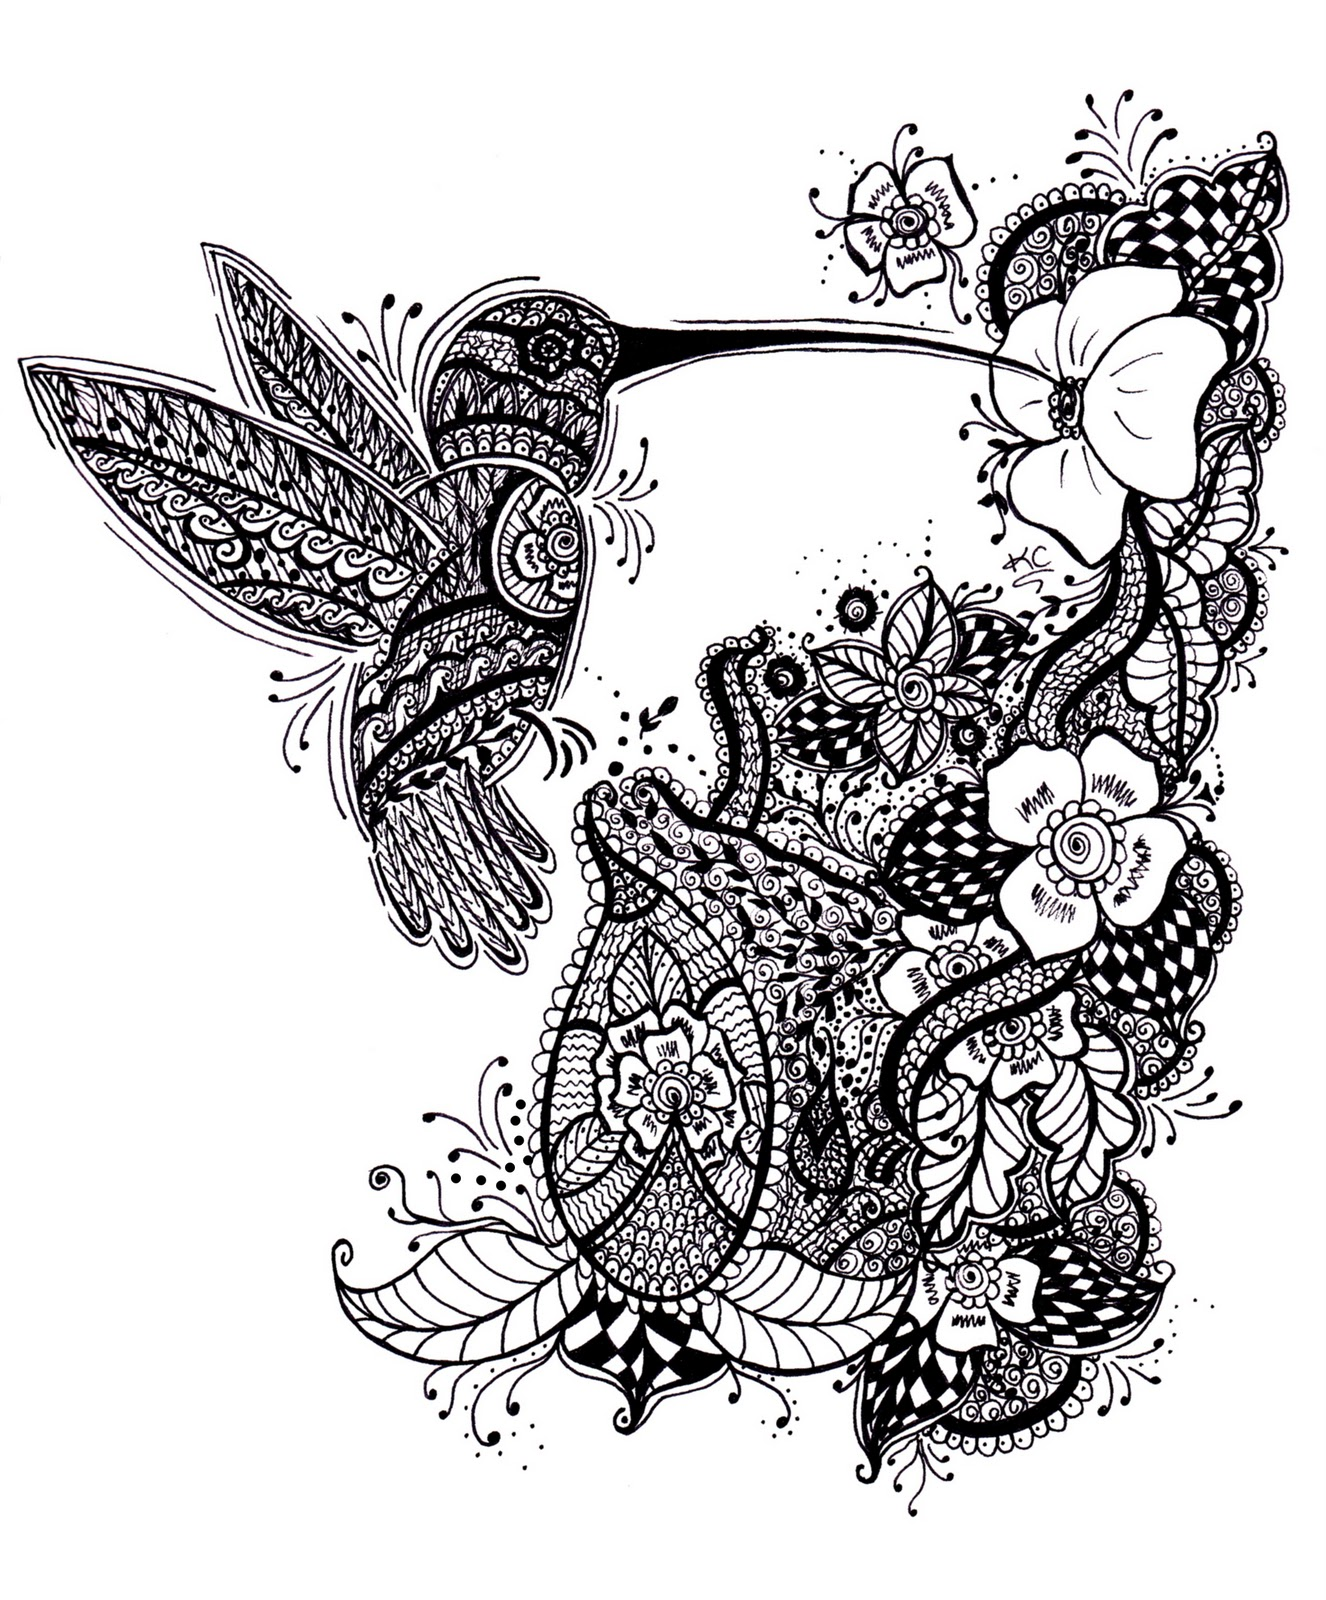 Bird Henna Tattoo: Tattoos Of Humming Bird: Hummingbird Tattoo Black And White